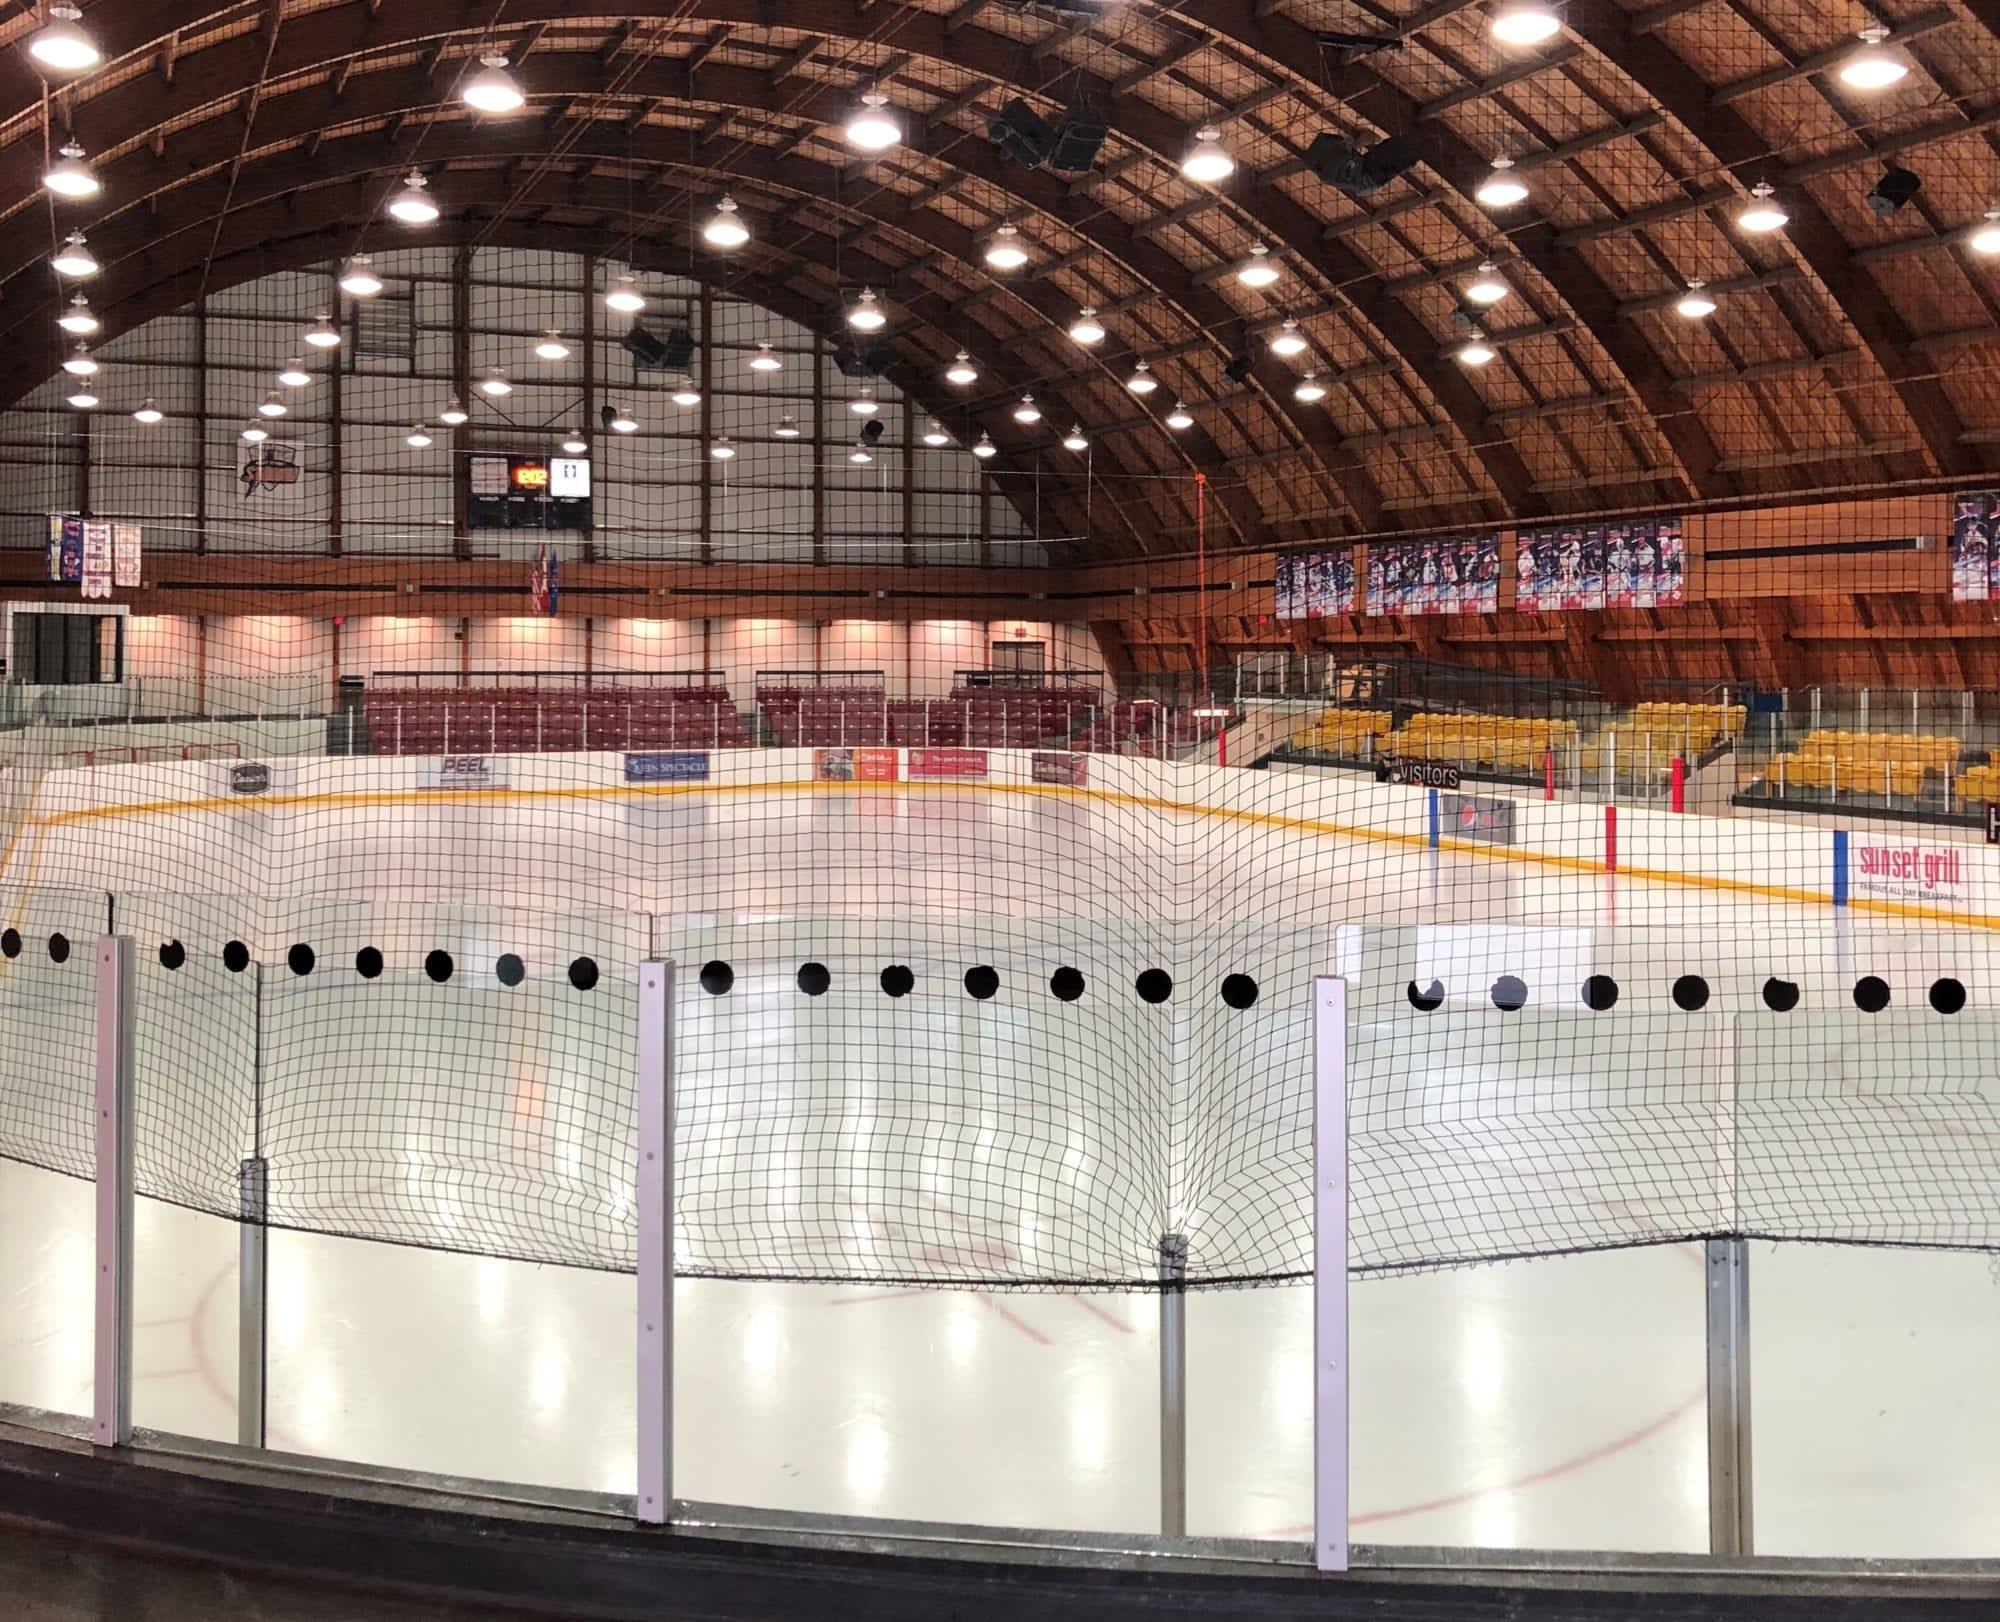 box lacrosse rink